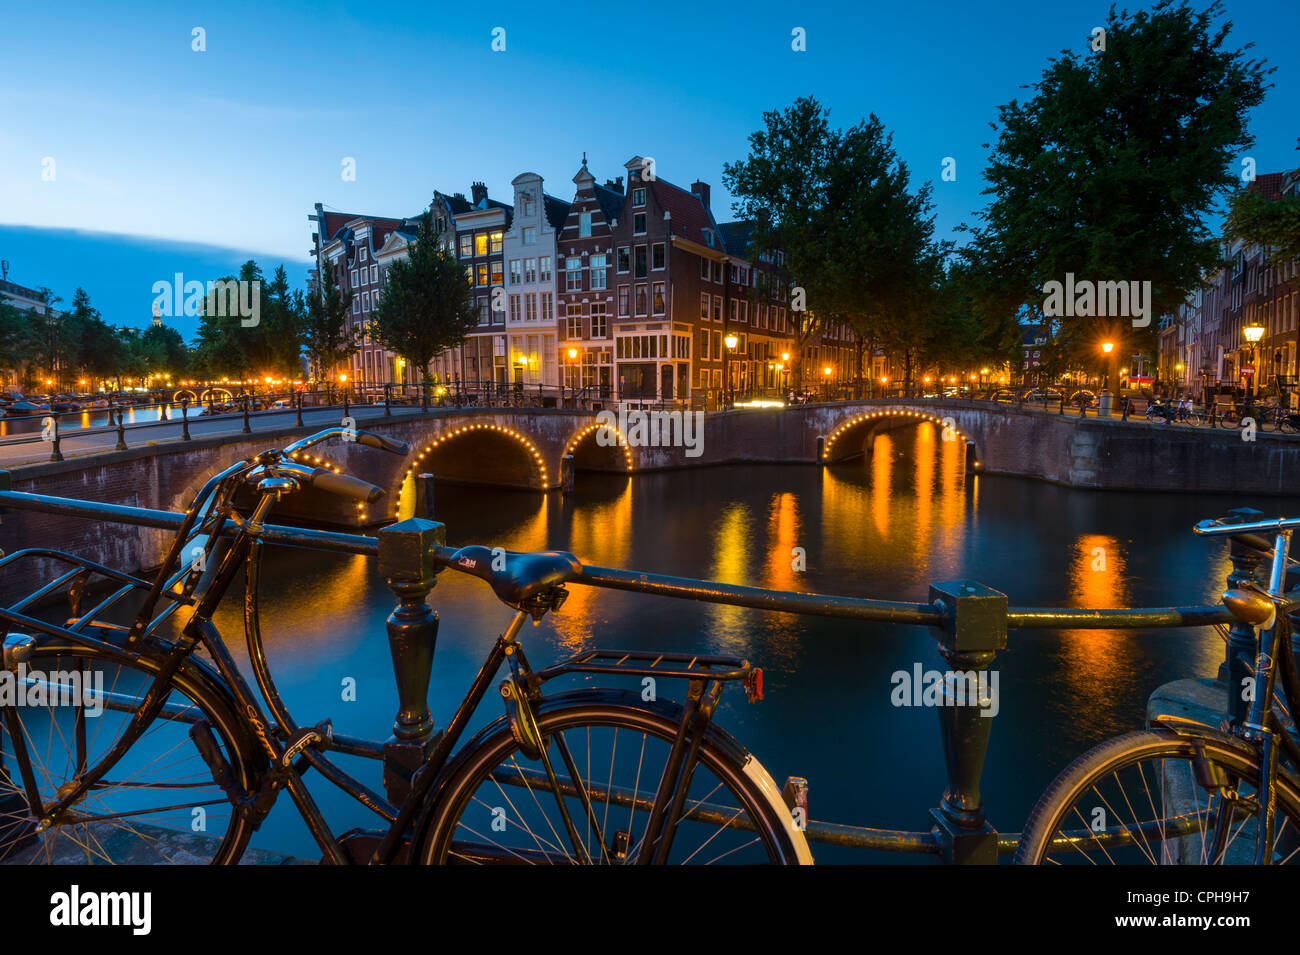 Kaizersgracht at dusk Amsterdam, Netherlands, Holland - Stock Image